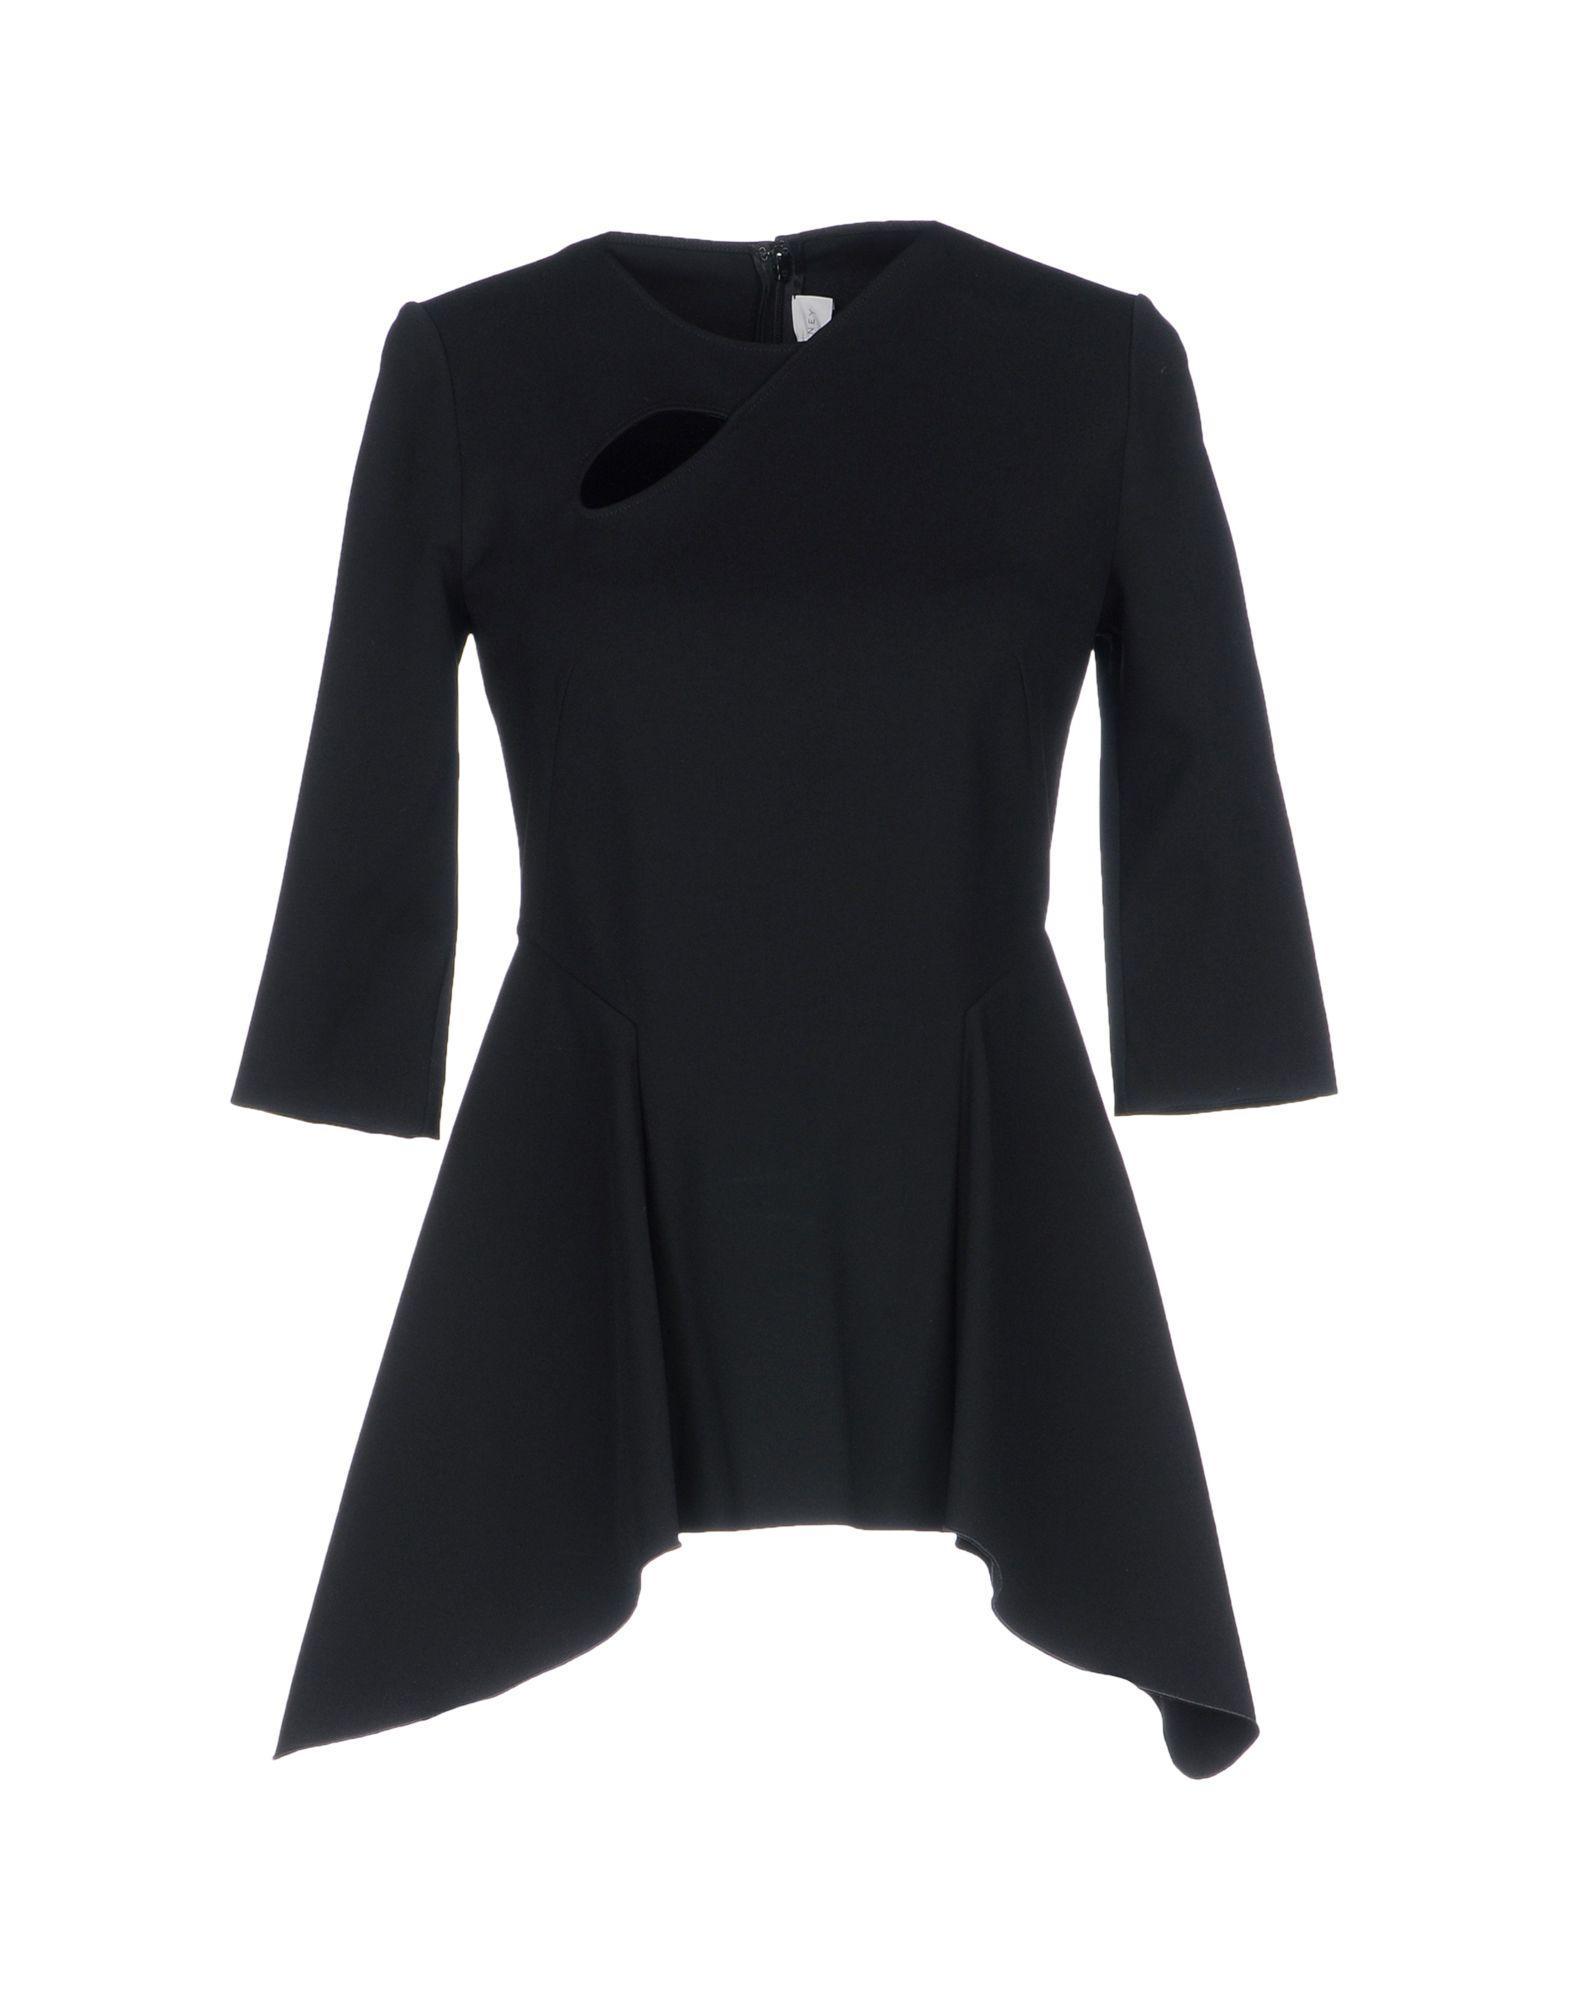 Stella Mccartney In Black